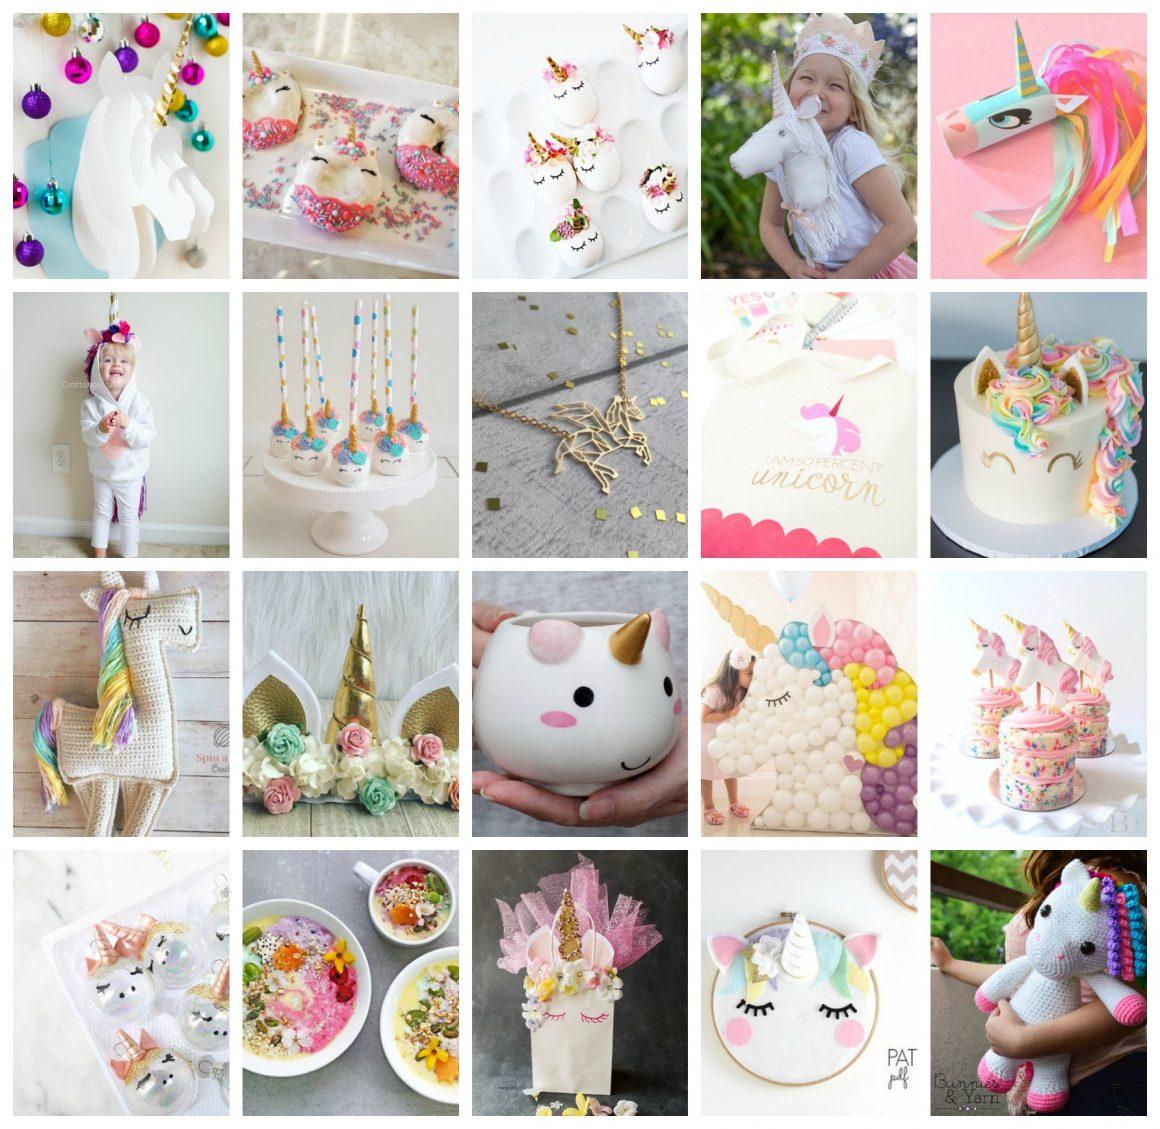 75 Magically Inspiring Unicorn Crafts Diys Foods And Gift Ideas